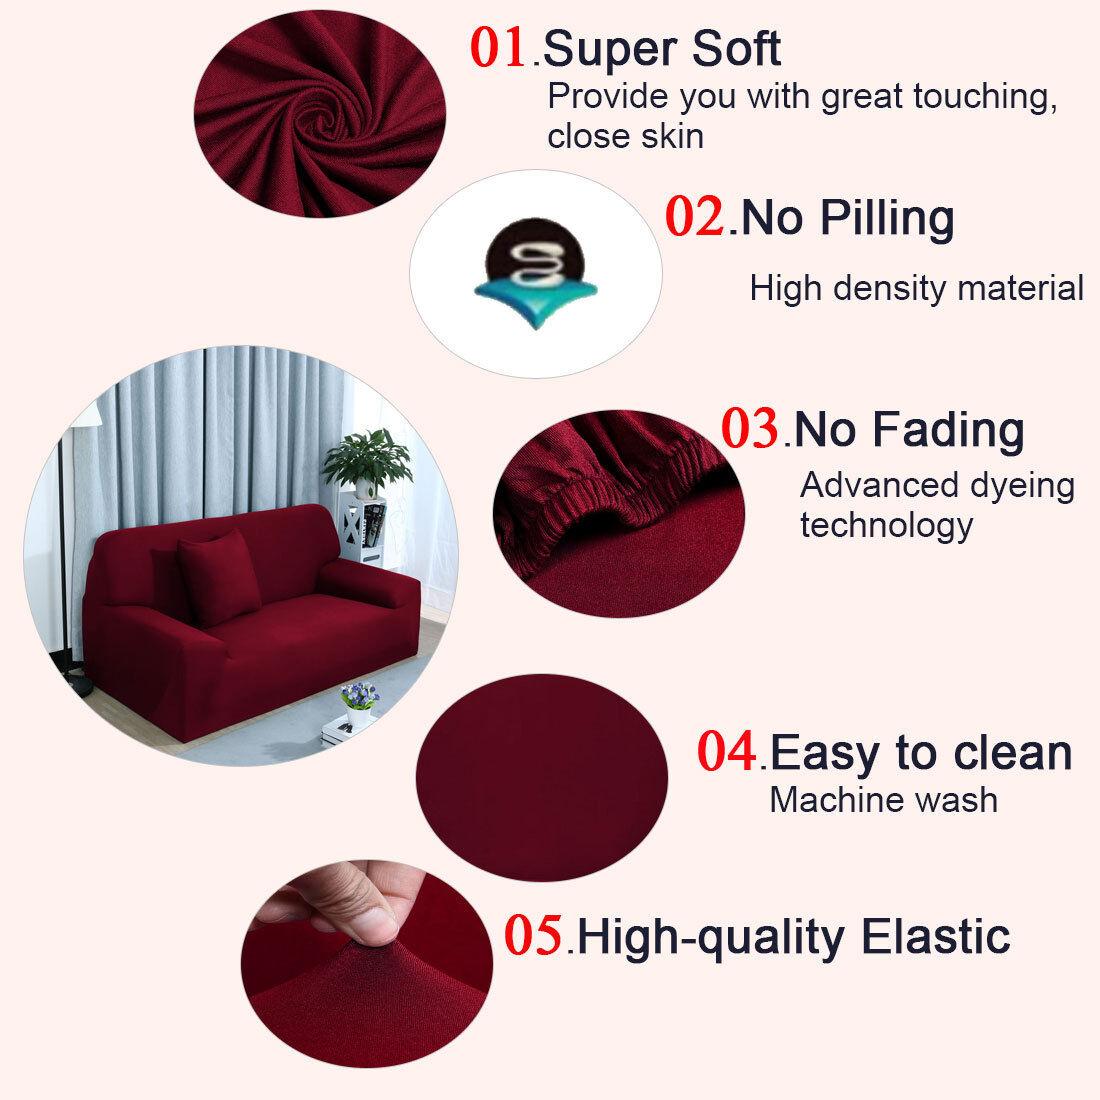 Incredible Details Over 2018 Hot L Shape Stretch Elastic Fabric Sofa Cover Sectional Corner Couch Covers Inzonedesignstudio Interior Chair Design Inzonedesignstudiocom